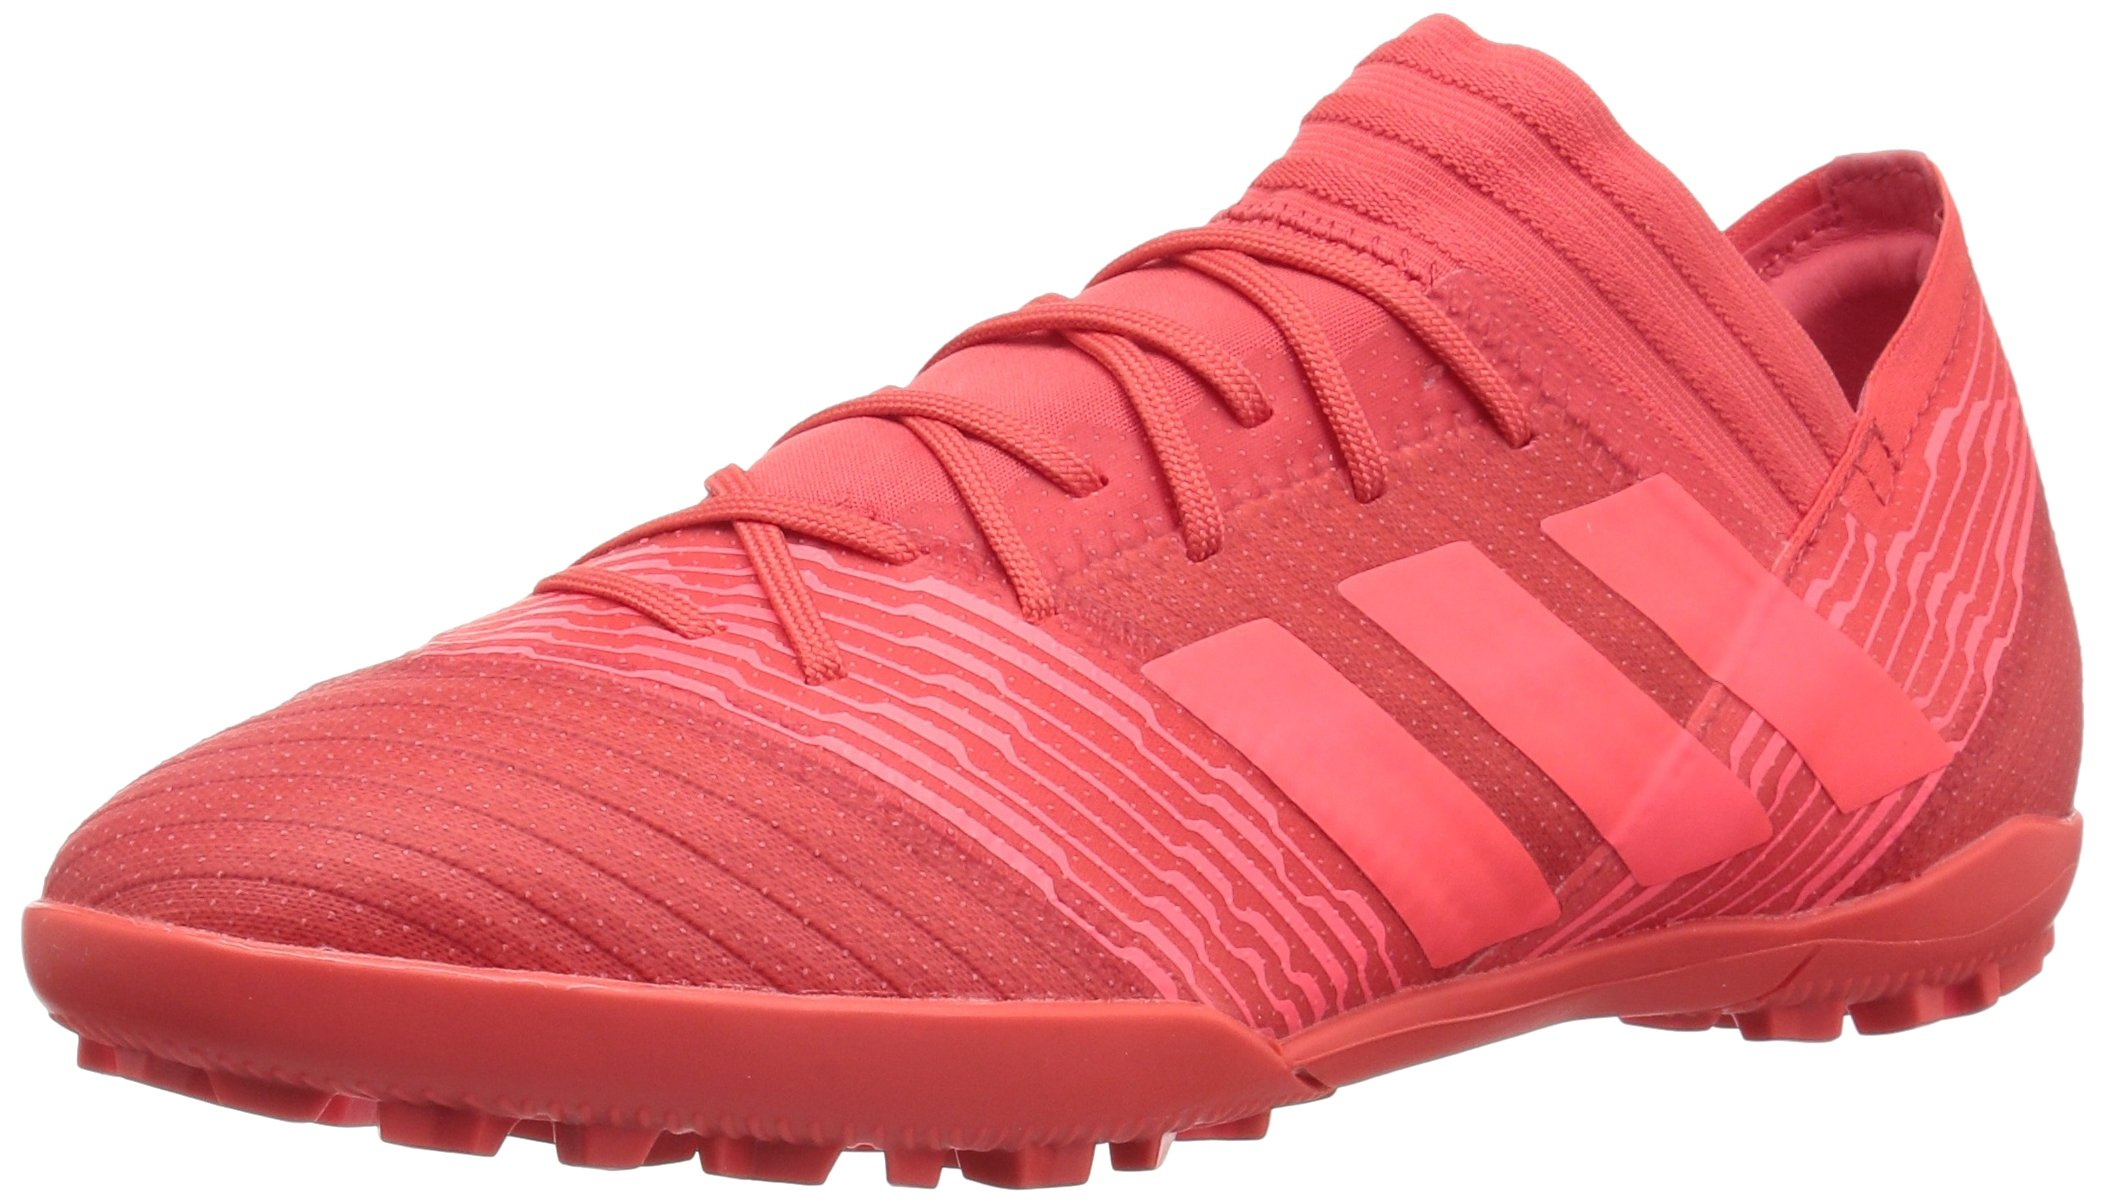 adidas Men's Nemeziz Tango 17.3 TF Soccer Shoe, Real Coral/Red Zest/Core Black, 9 M US by adidas